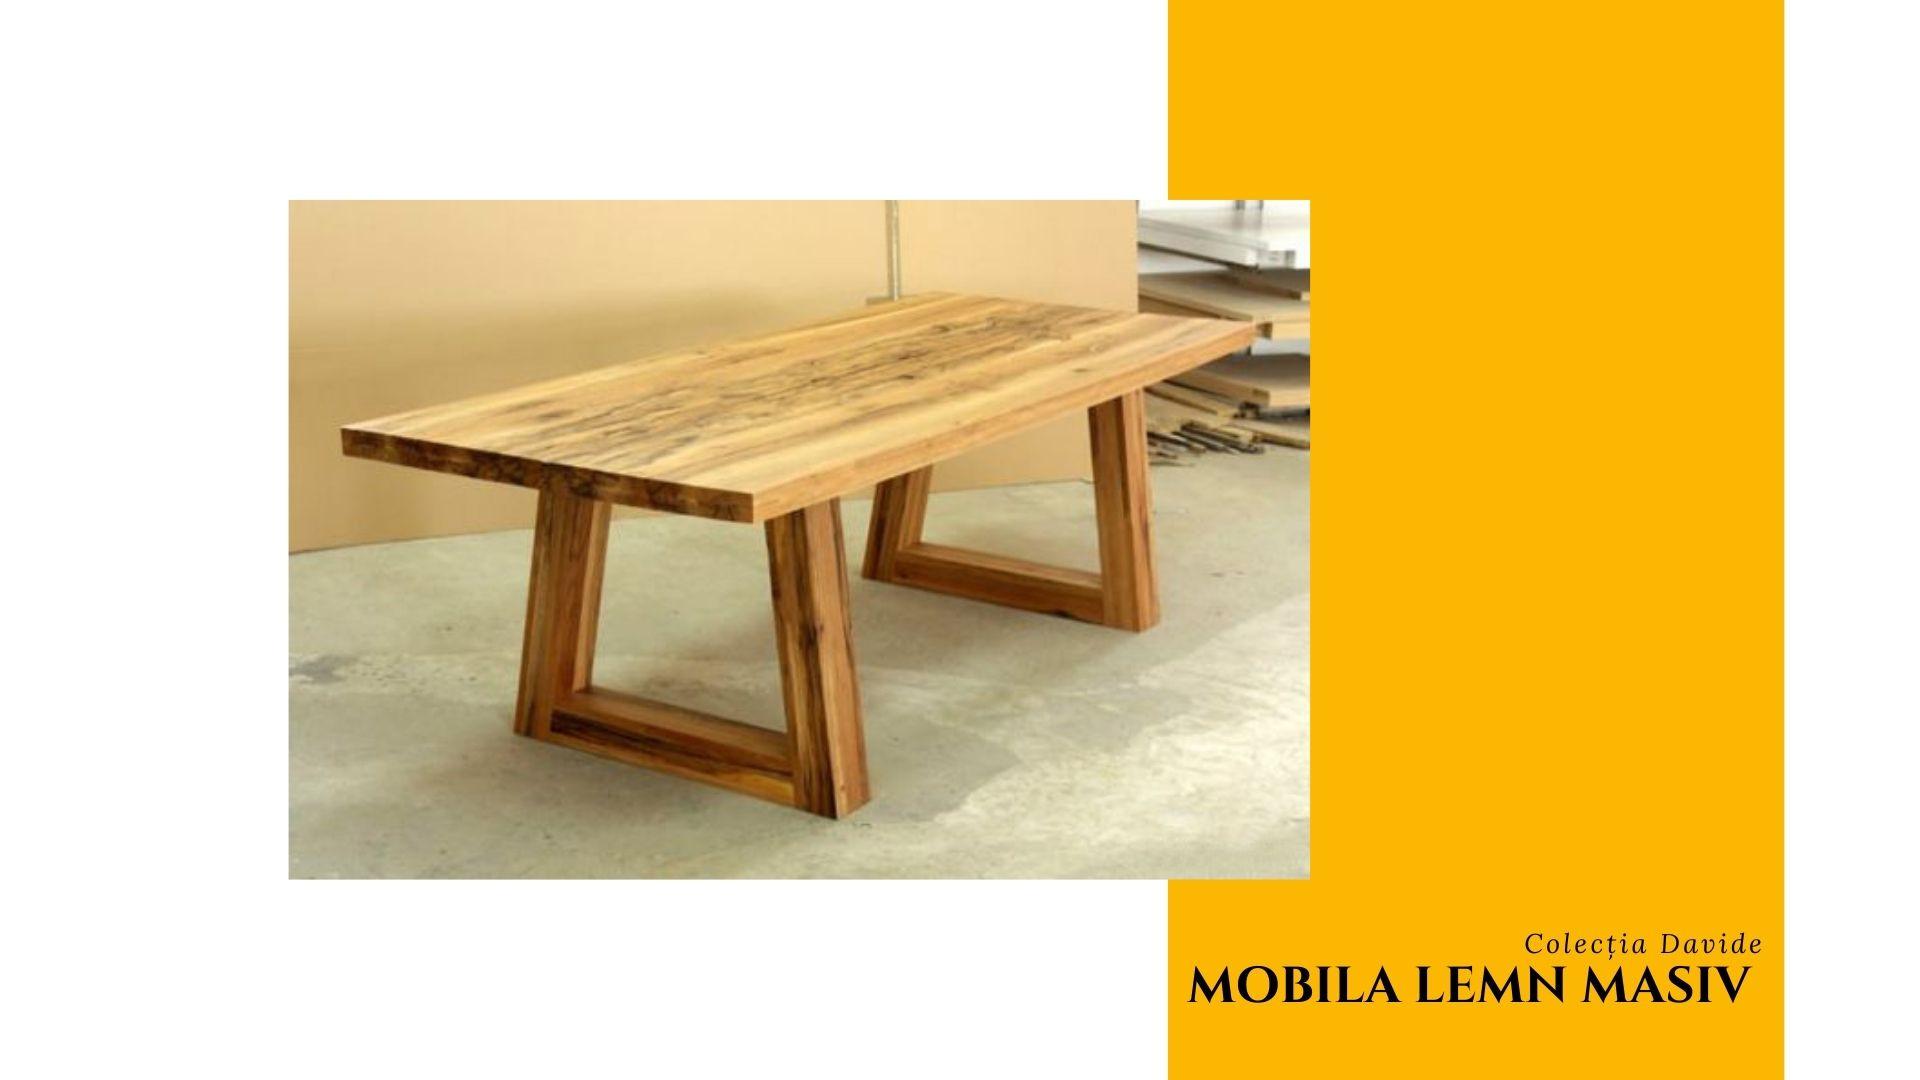 mobilier lemn masiv neamt david